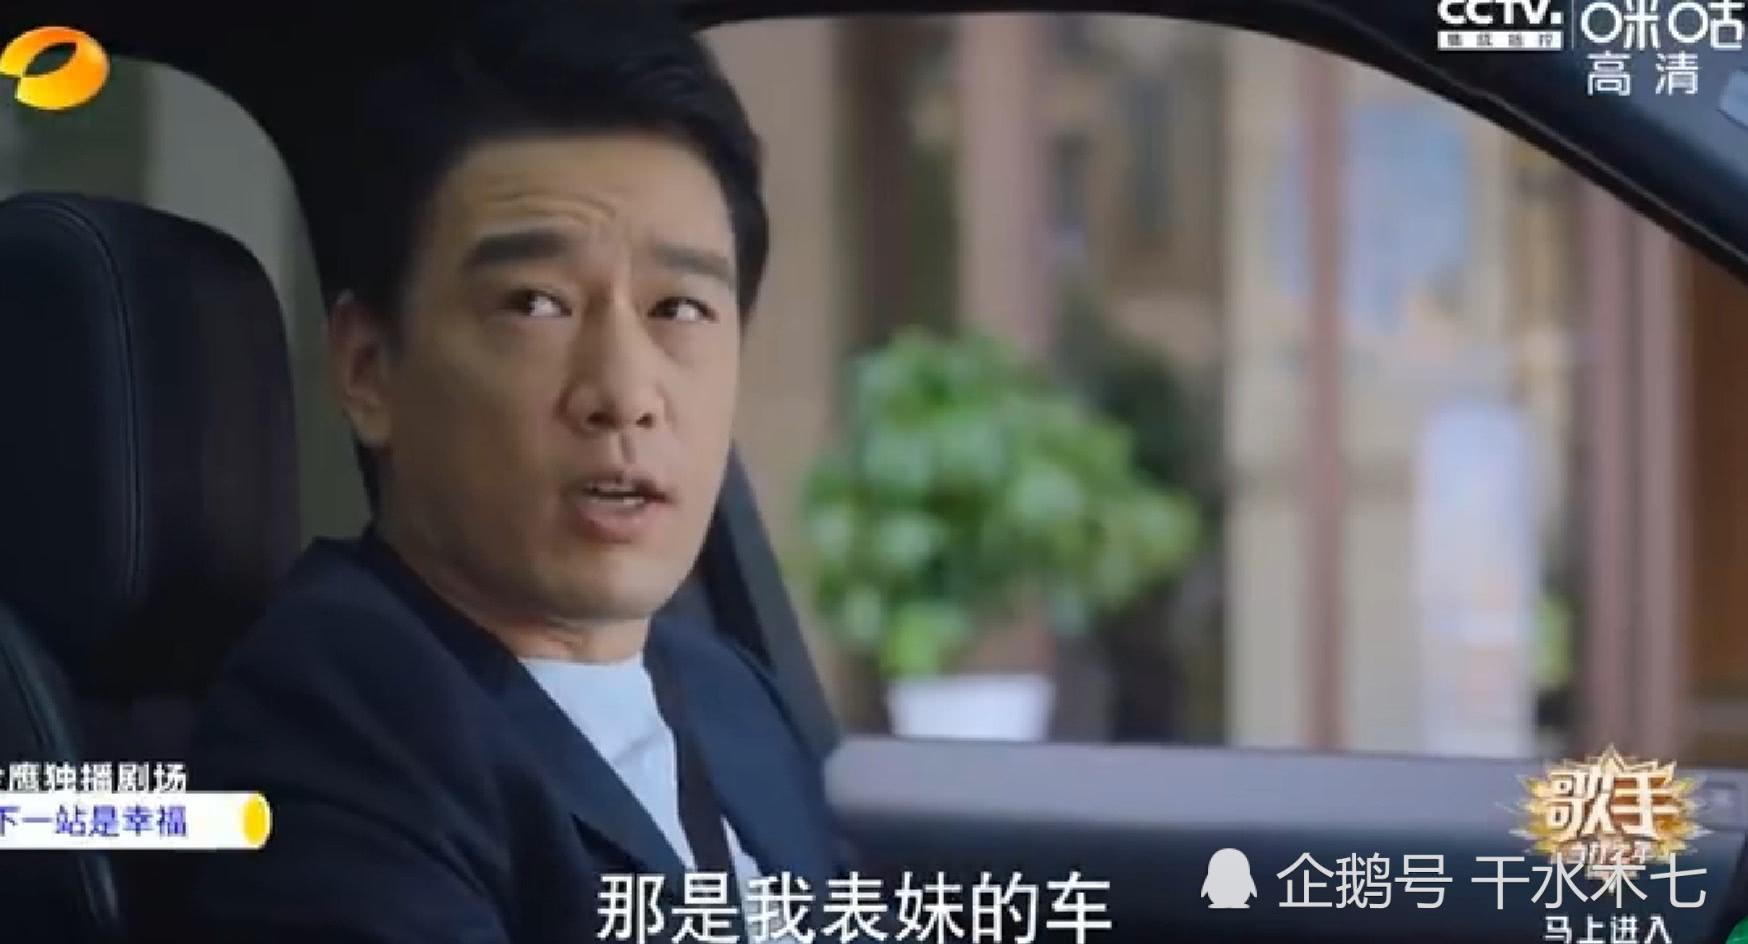 <b>《下一站是幸福》叶鹿鸣不同意贺灿阳和蔡敏敏谈恋爱,蔡敏敏离家出走!</b>